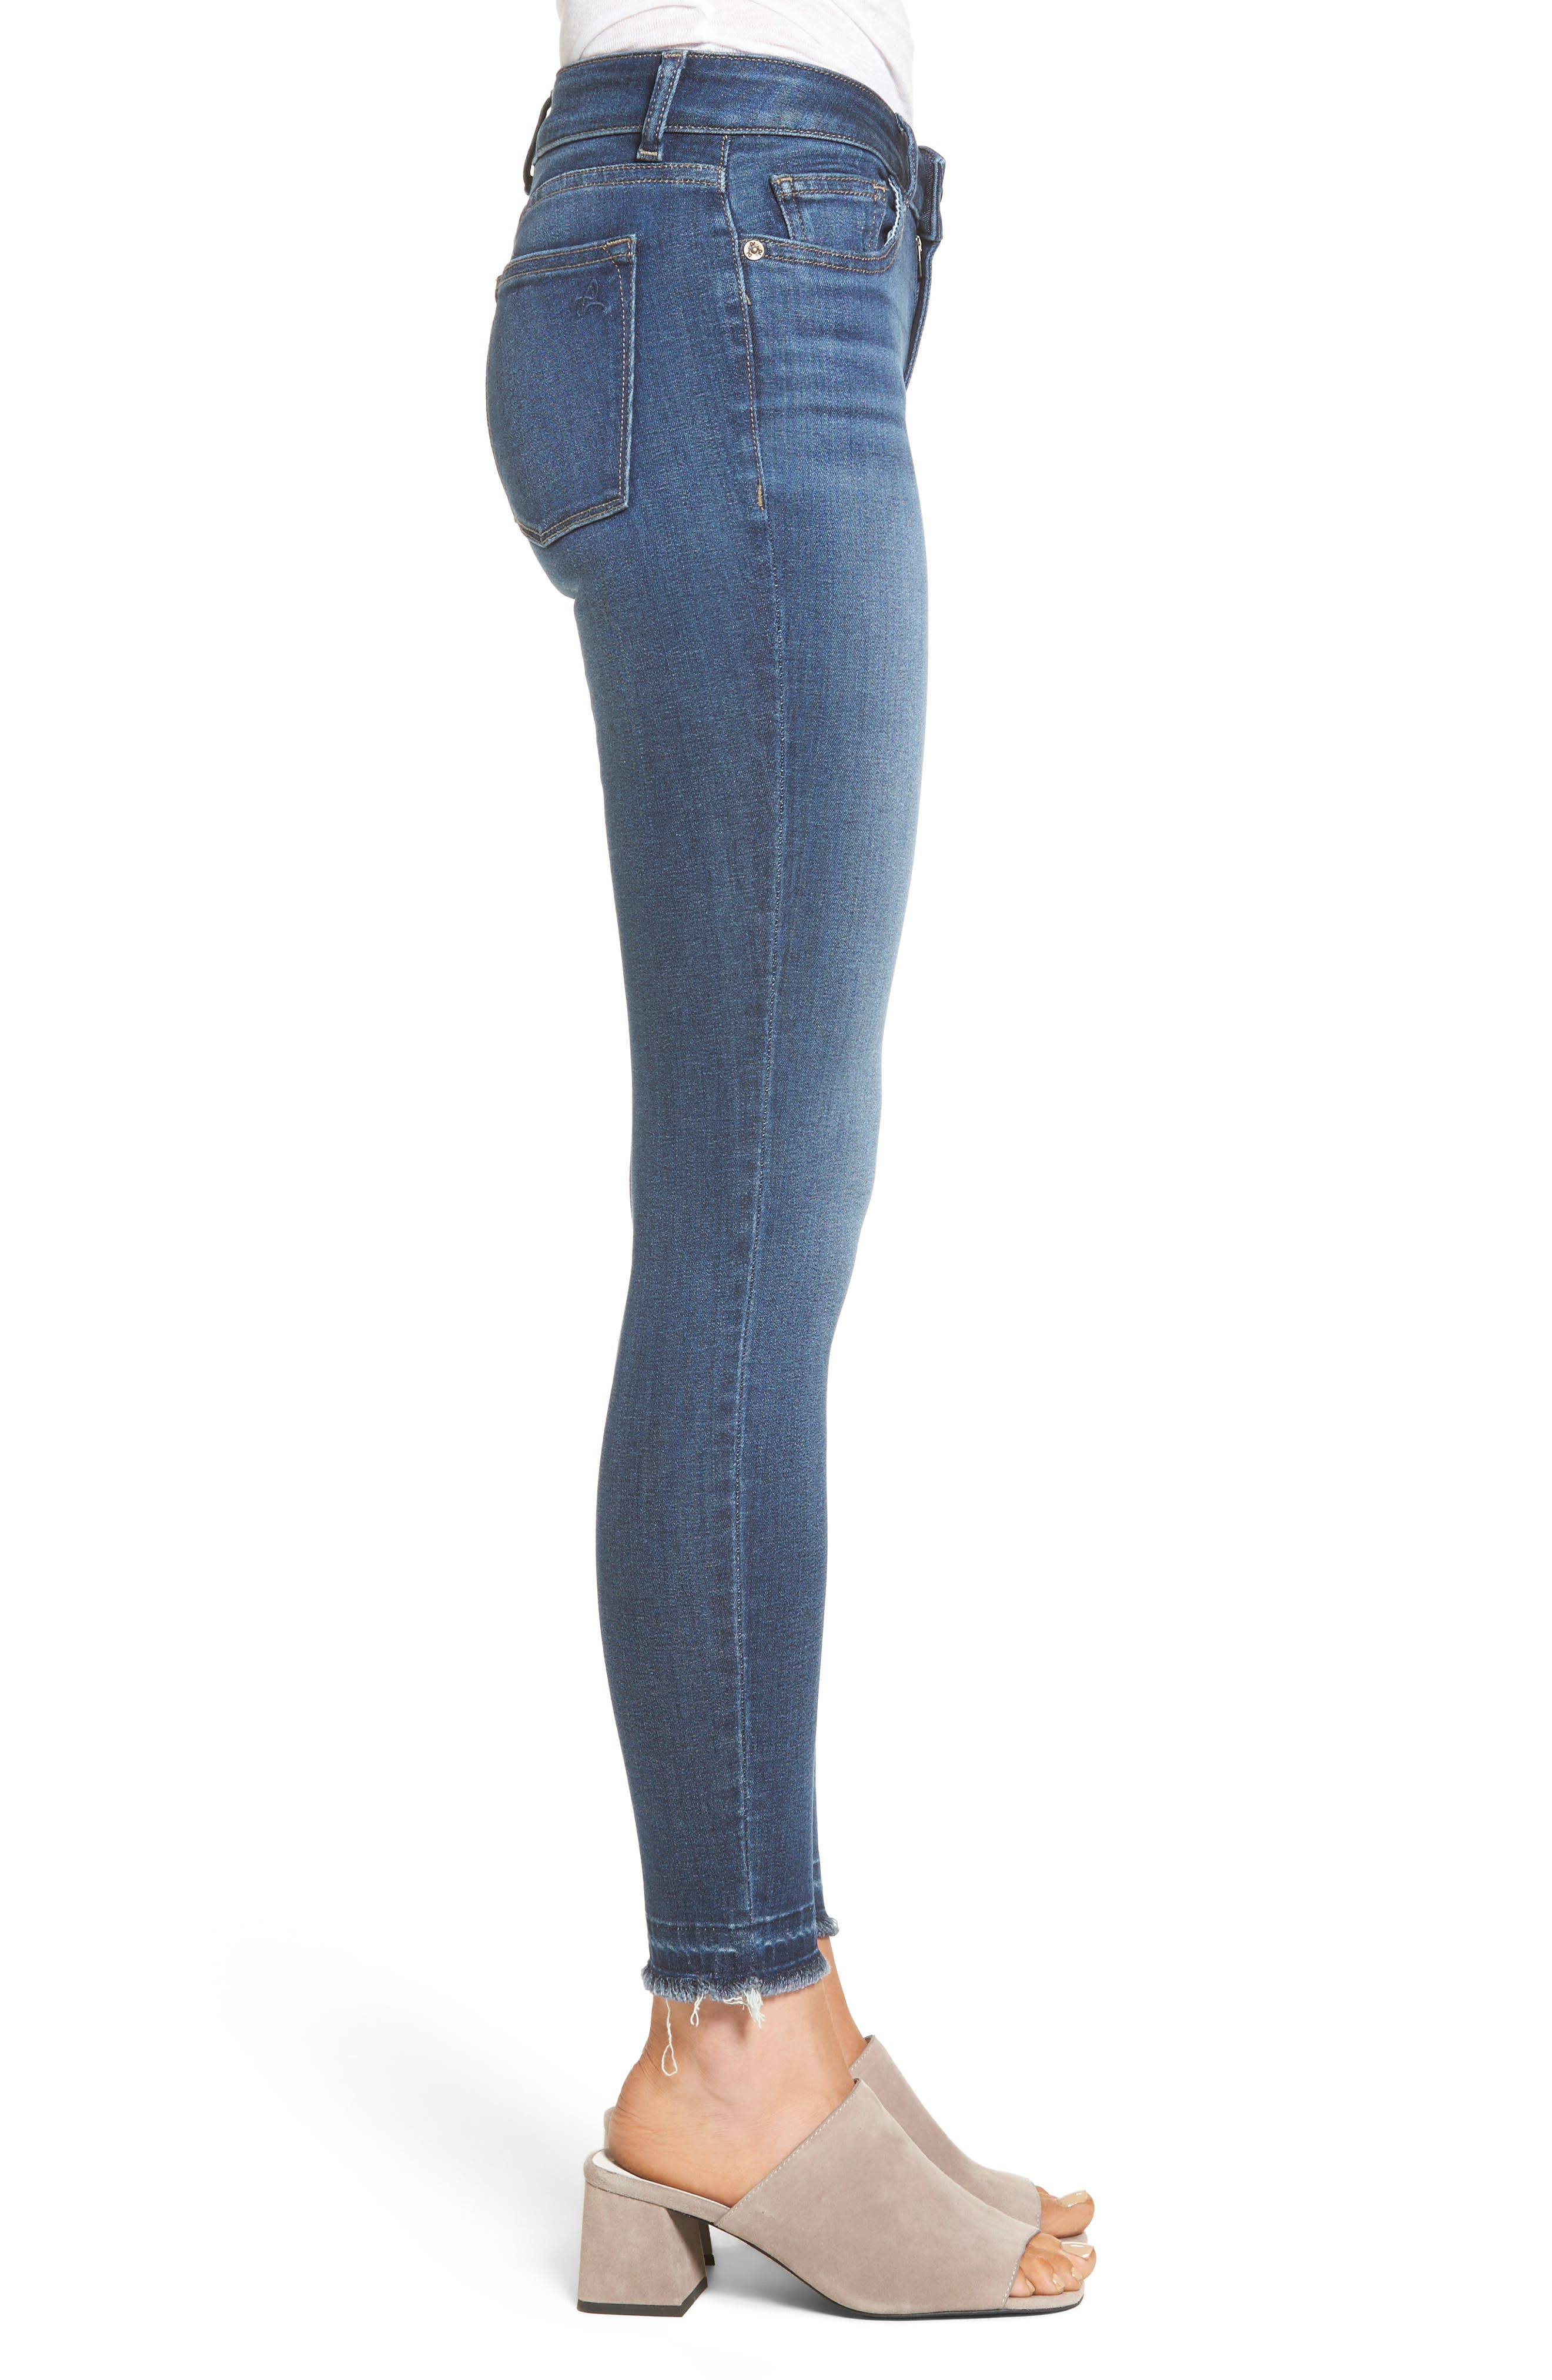 Emma Power Legging Jeans,                             Alternate thumbnail 3, color,                             405